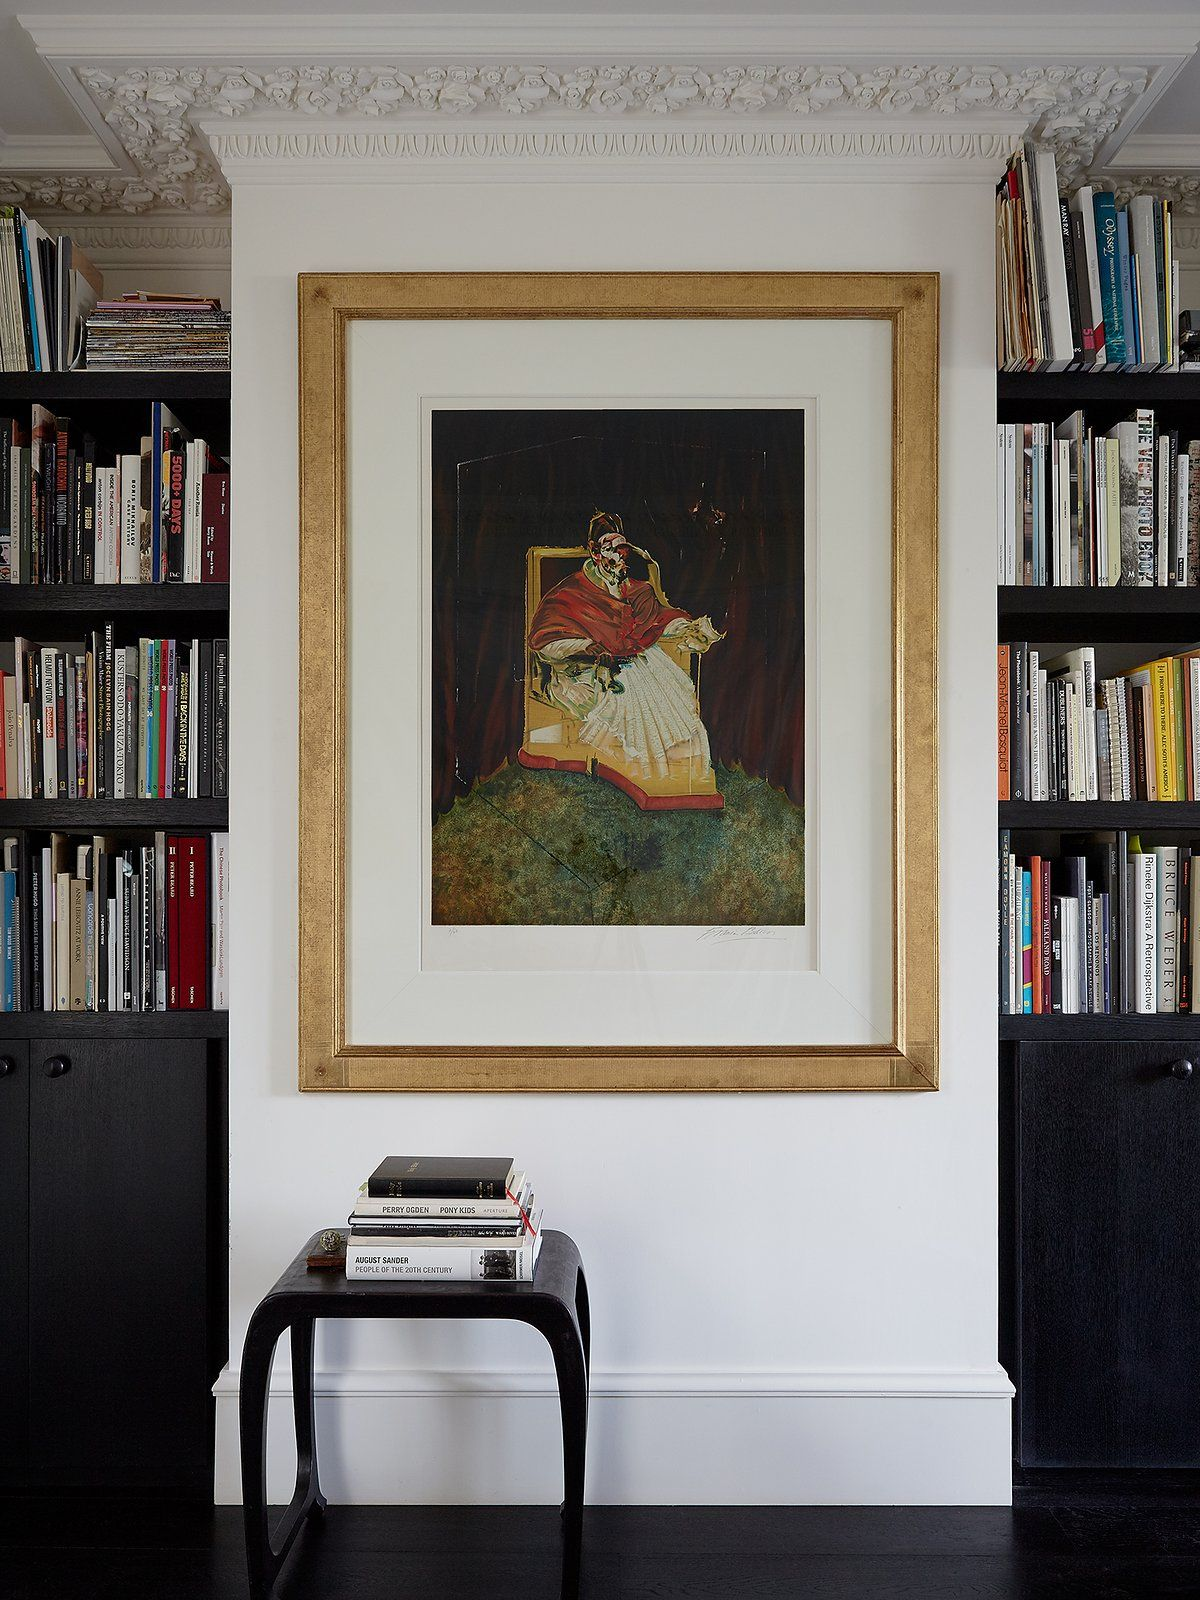 Simone Rochas Chic London Home - The Neo Trad #Bookcase #Bookshelves